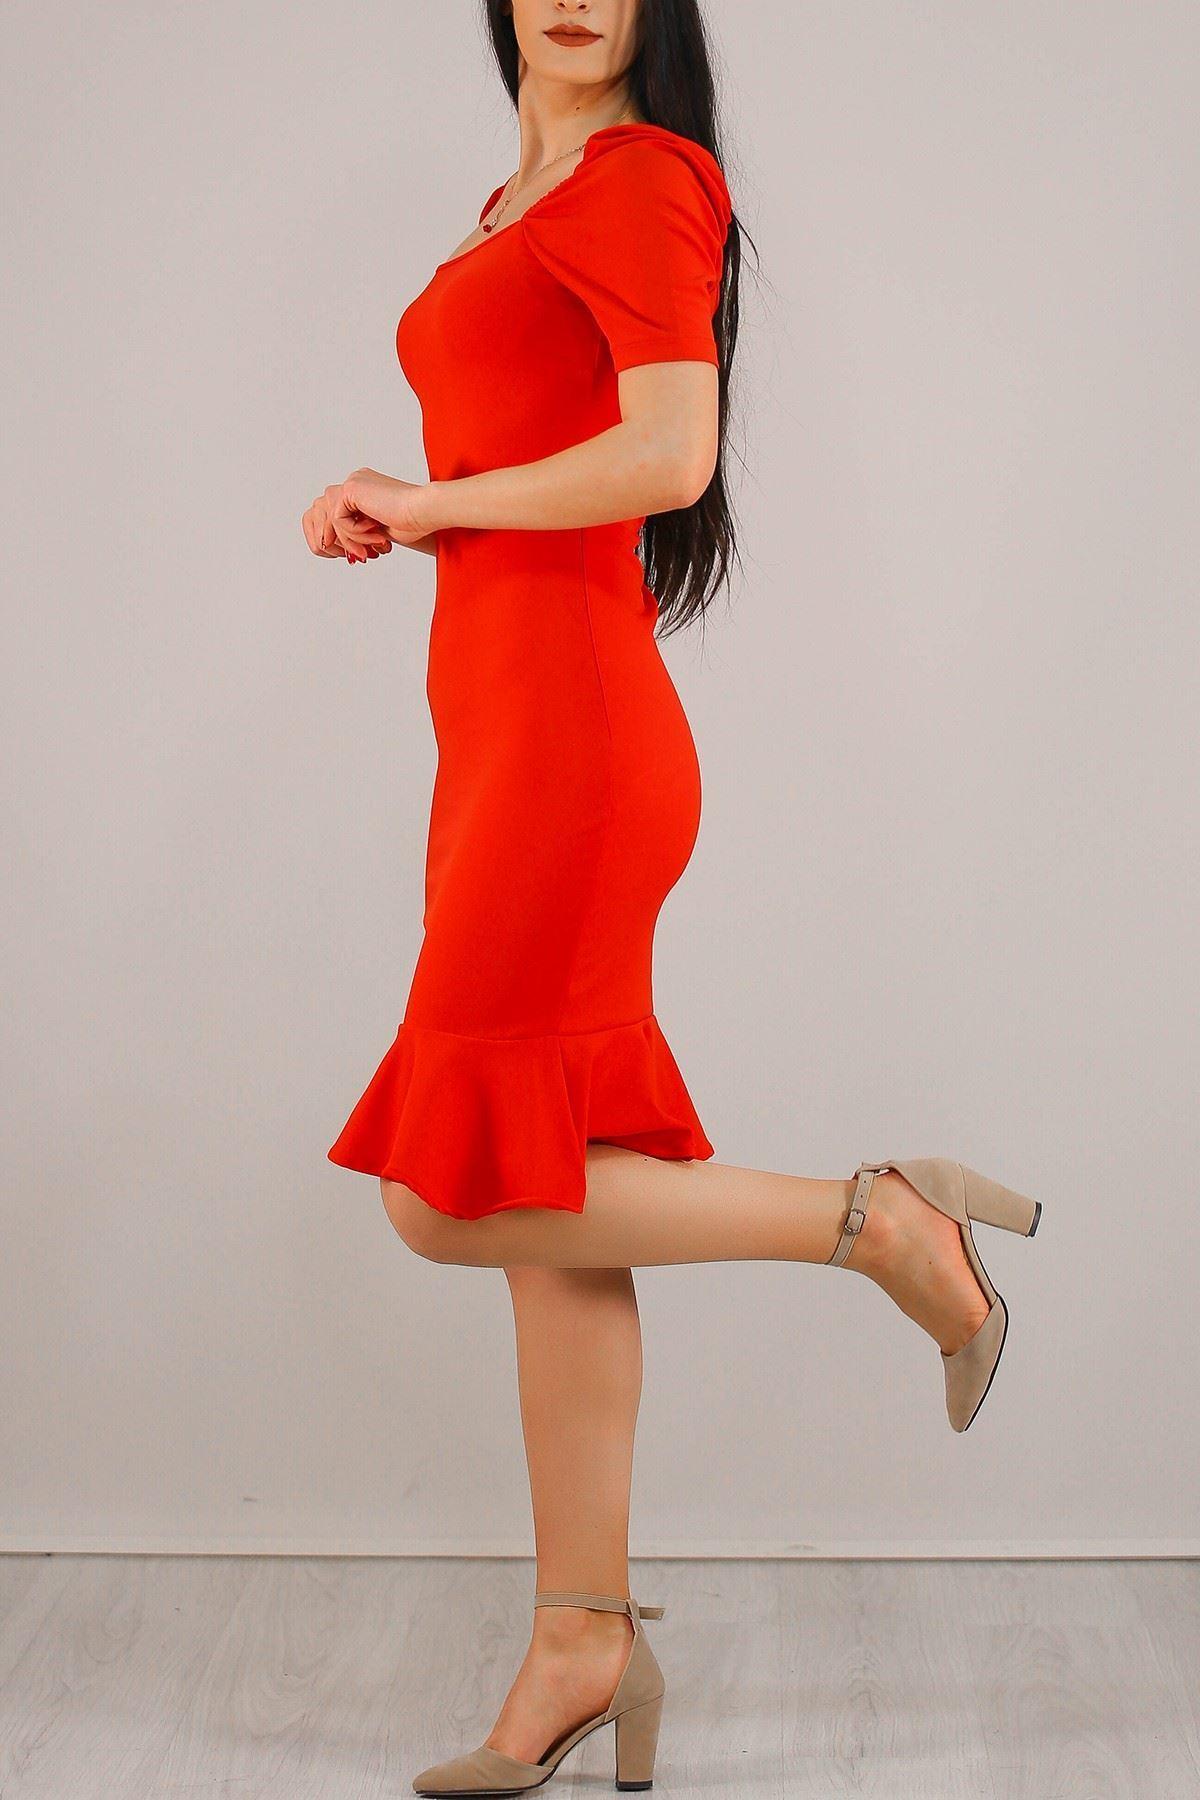 Prenses Kol Kaşkorse Elbise Kırmızı - 5198.994.